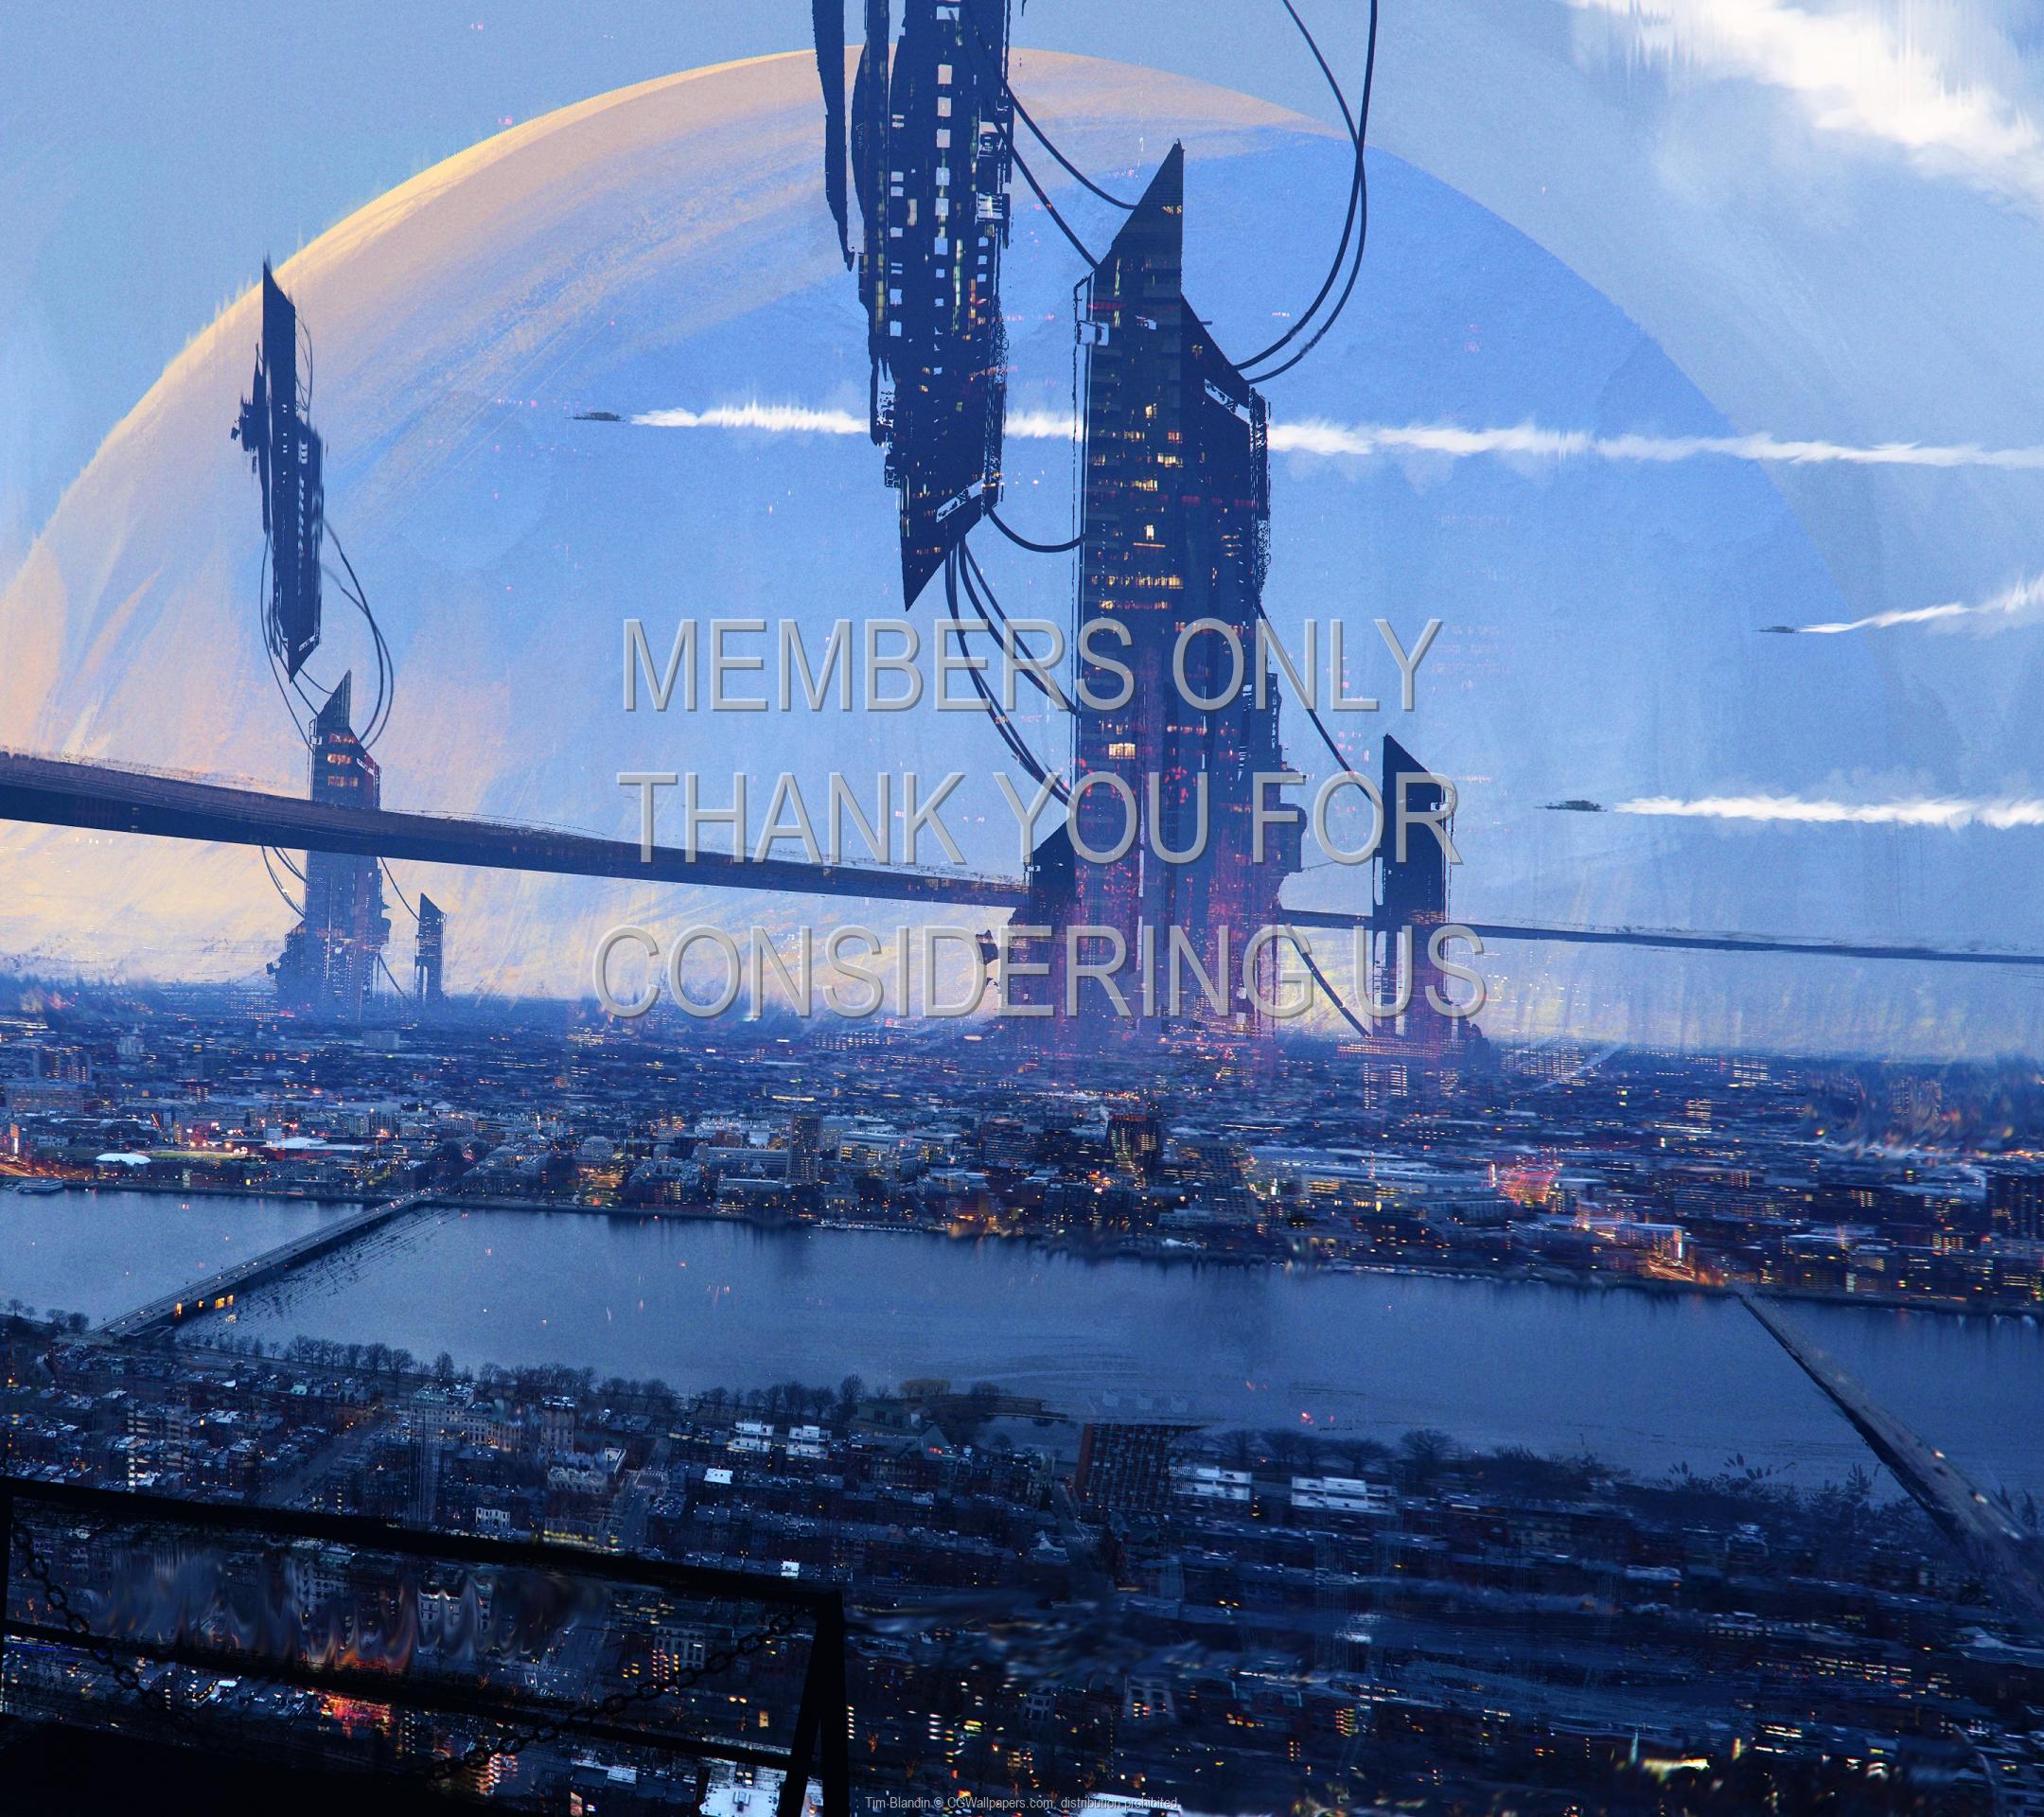 Tim Blandin 1080p Horizontal Mobile wallpaper or background 05